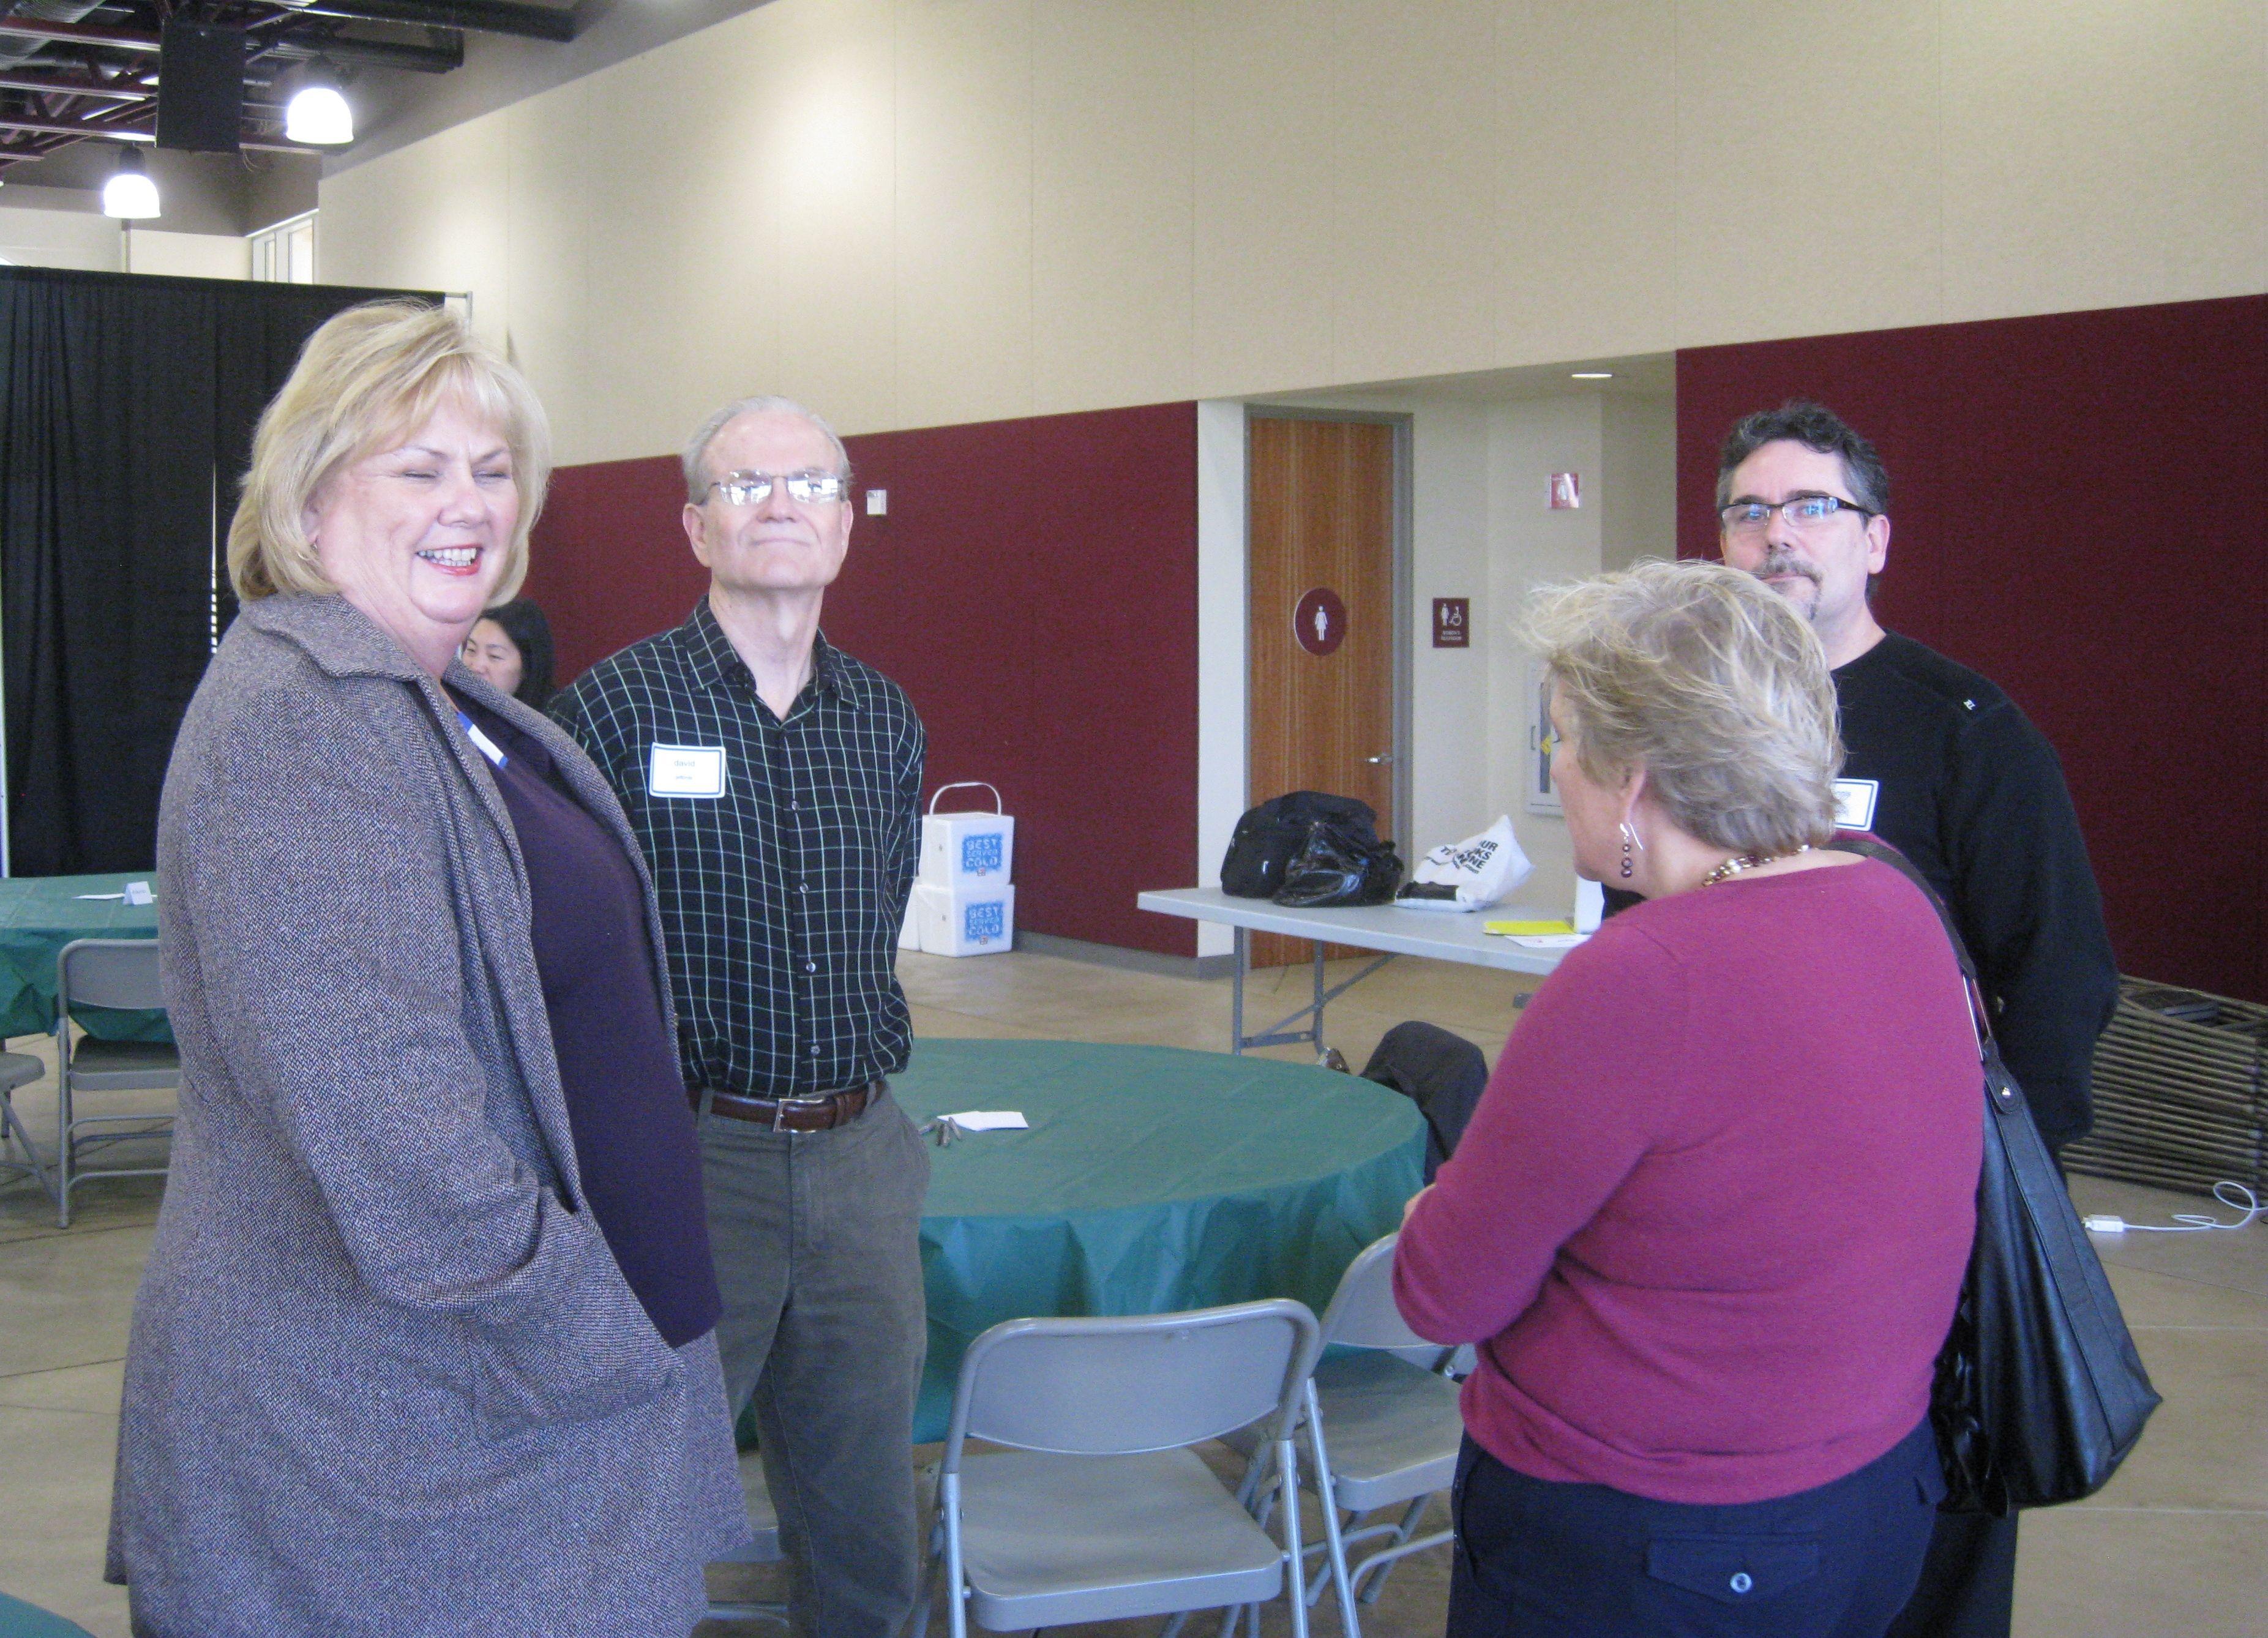 Bay Area Business Executives Meetup Group